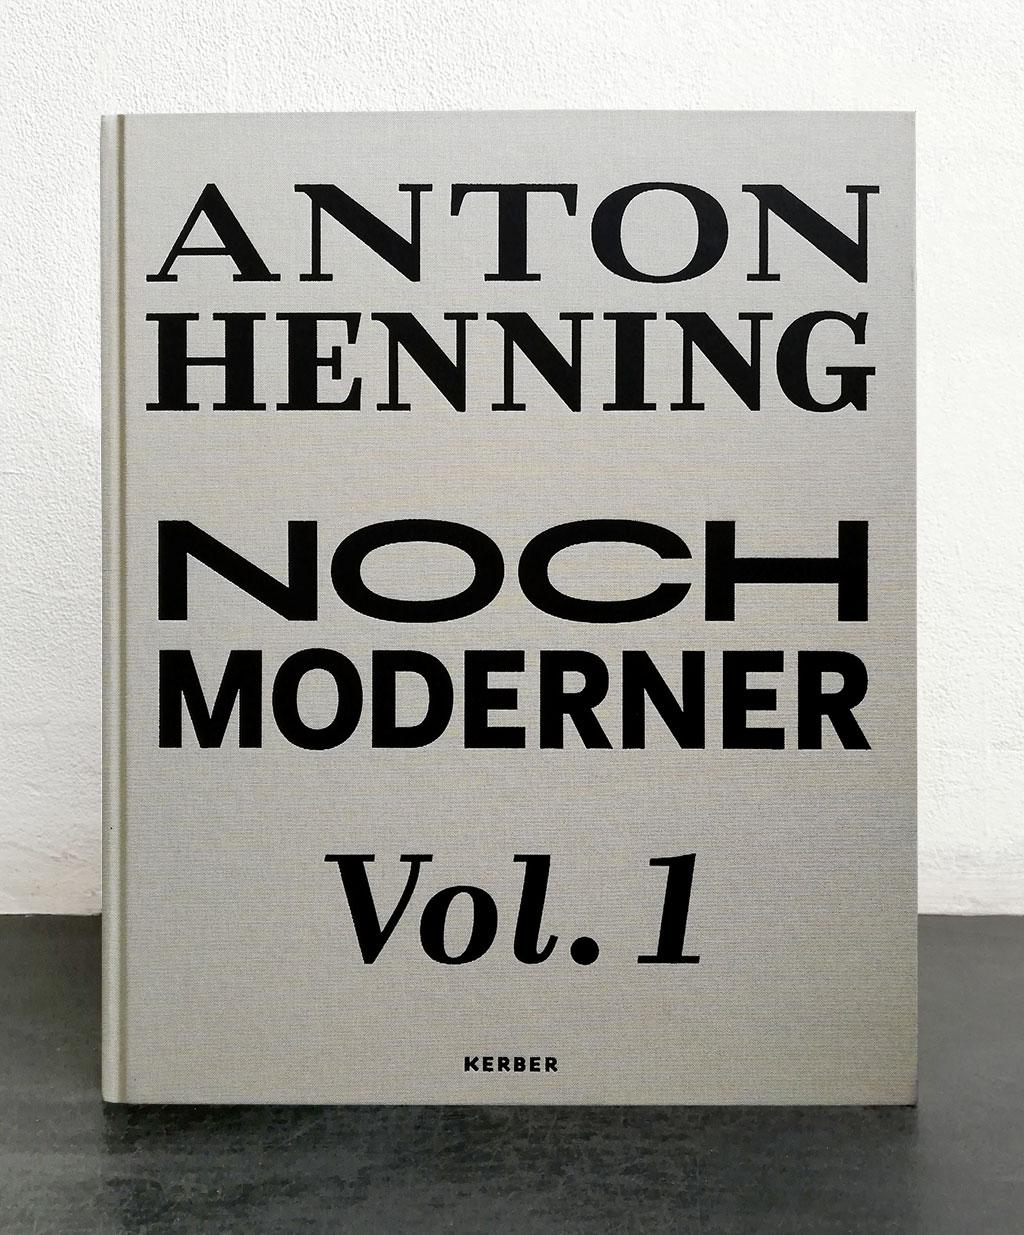 ANTON HENNING VOL. 1